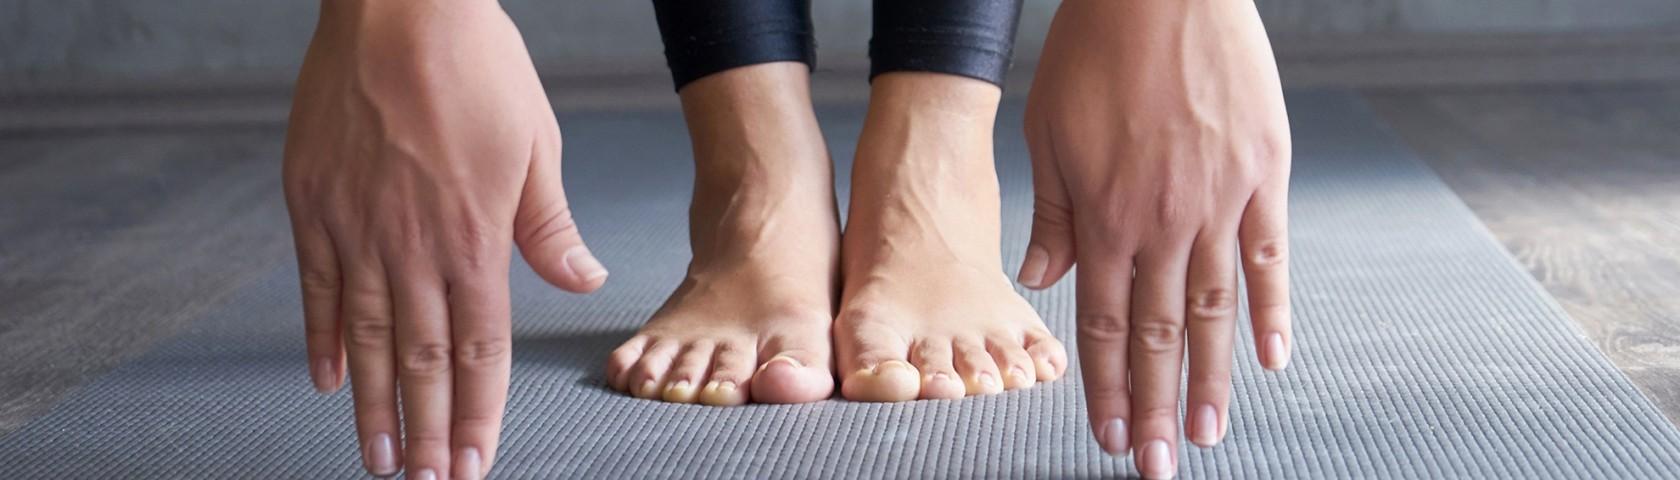 yoga-und-pilatesstudio-potsdam001.jpg